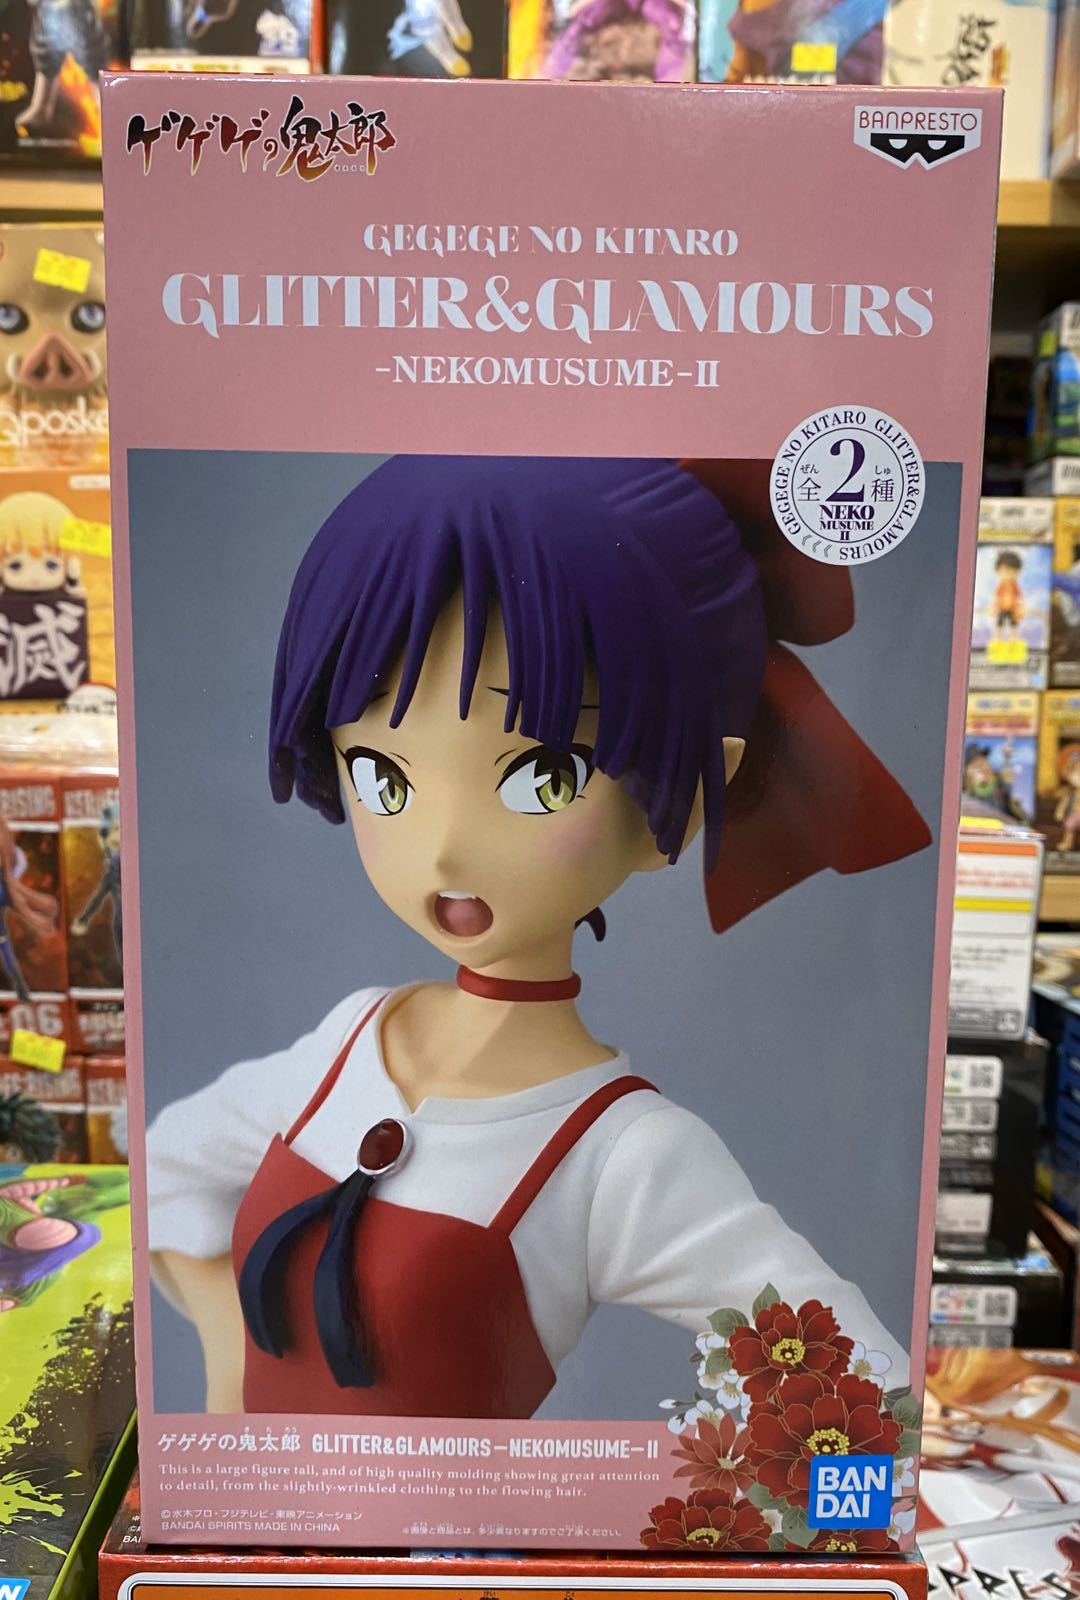 Banpresto GeGeGe no Kitaro Glitter /& Glamours Nekomusume 2